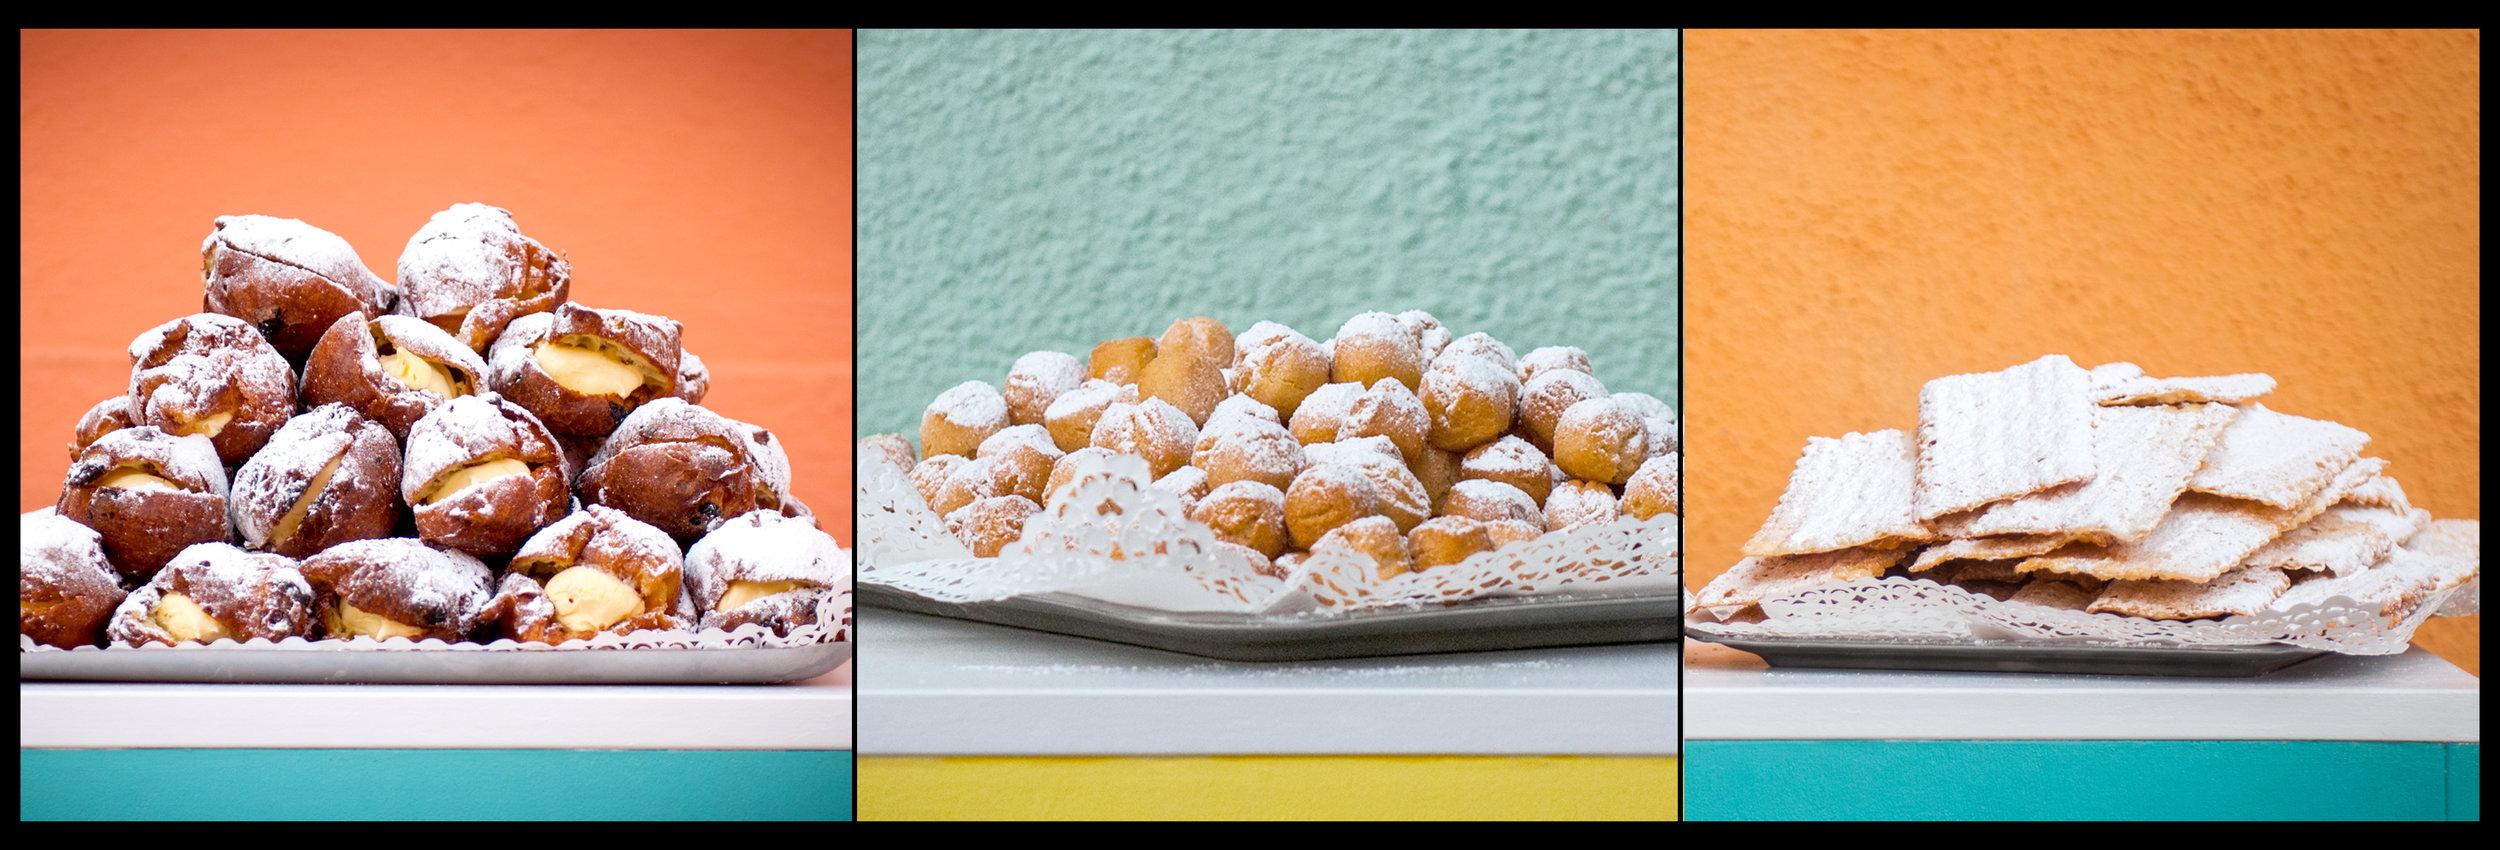 Fritoe-castagnole-galani.jpg